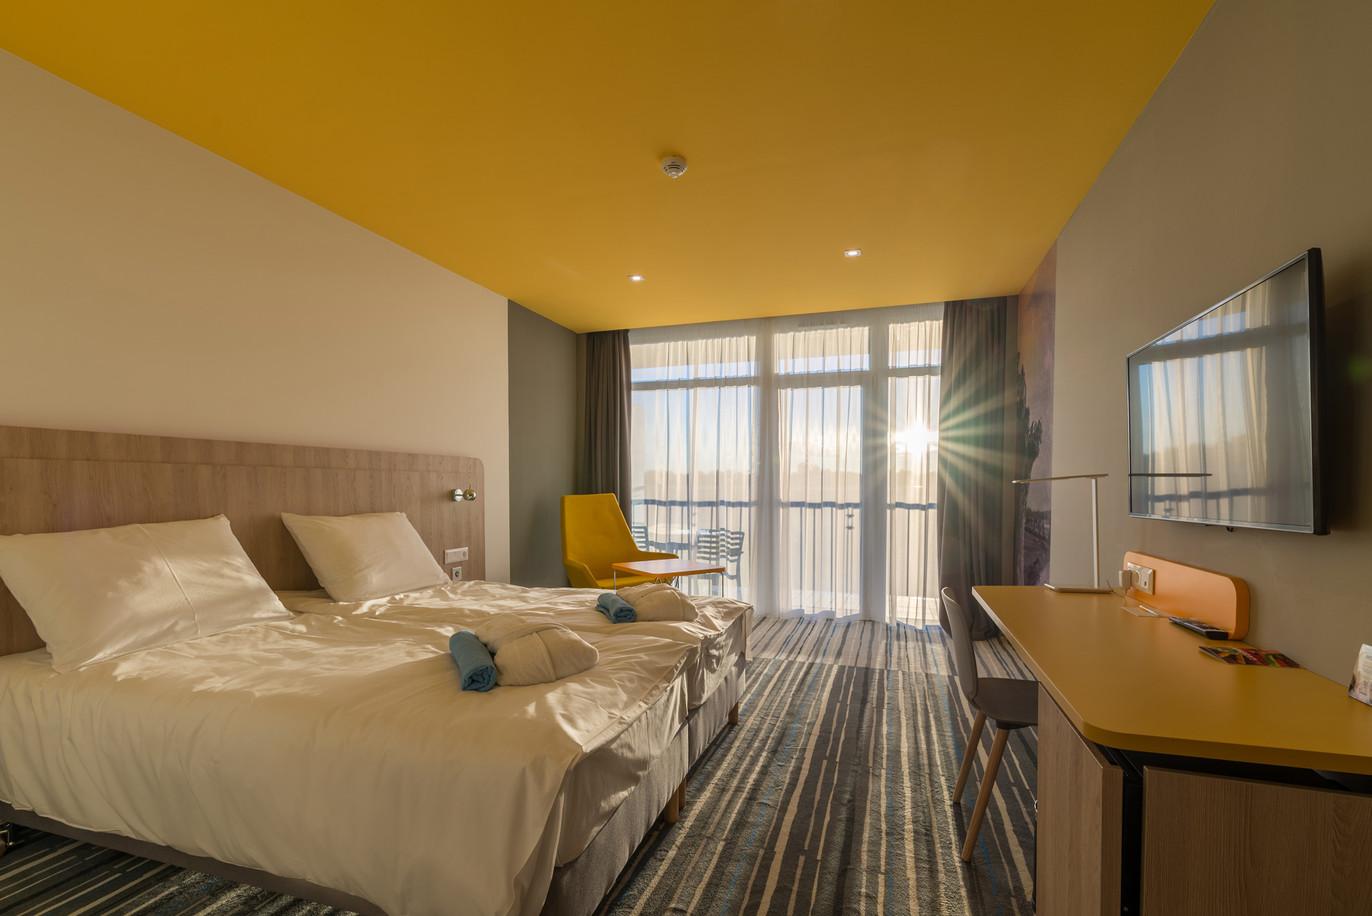 Rooms-142-HDR.jpg